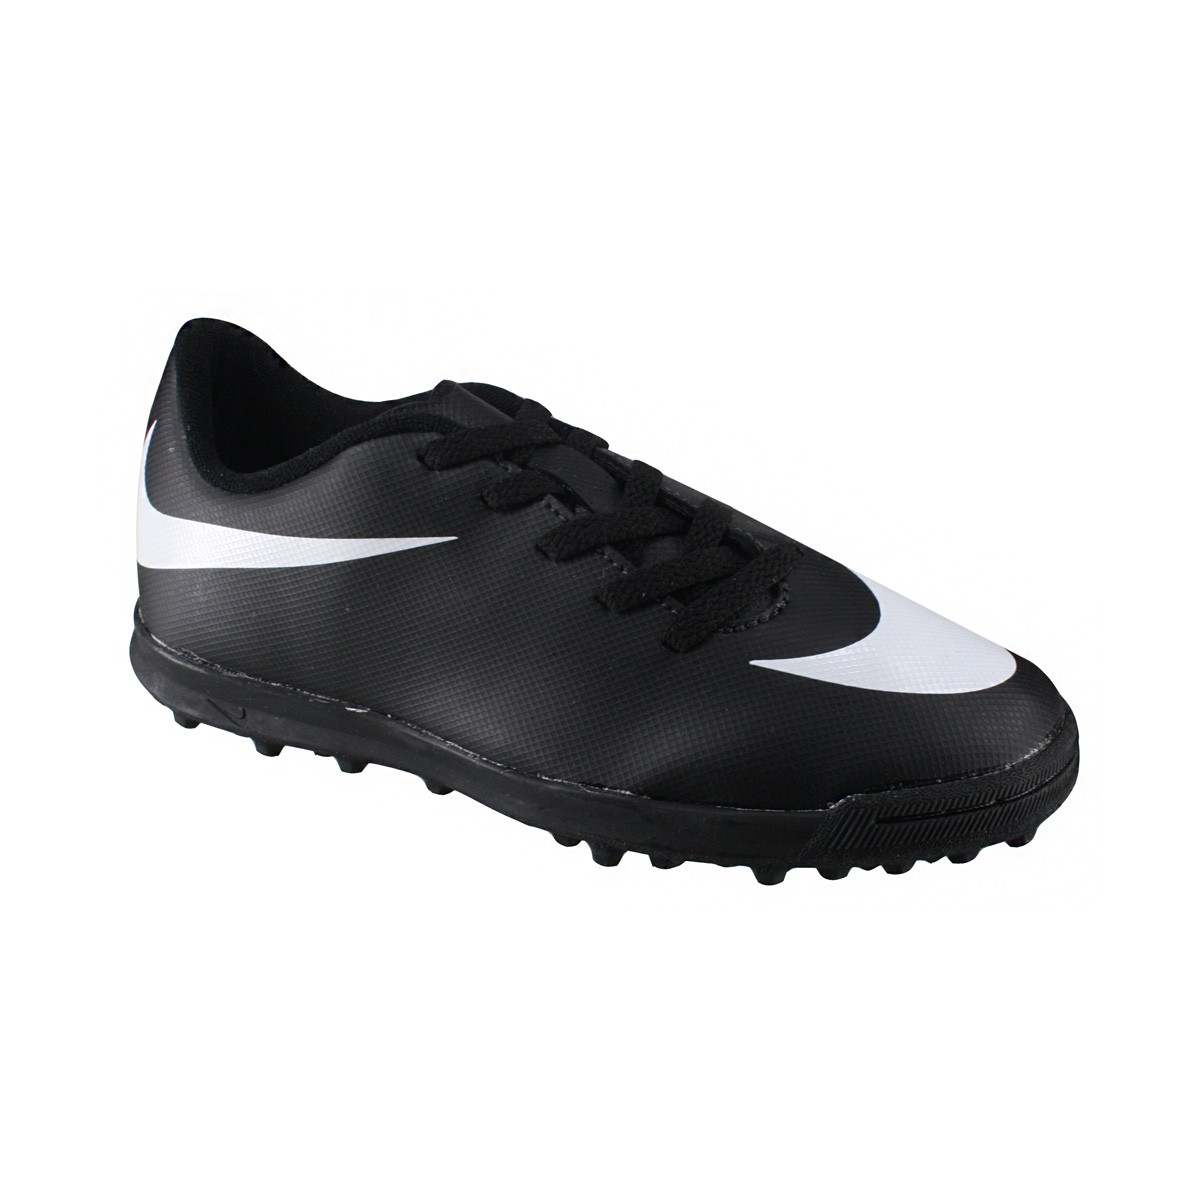 Chuteira Society Infantil Nike JR Bravata TF 768921-011 Preto Branco 74f1f745b7cd1